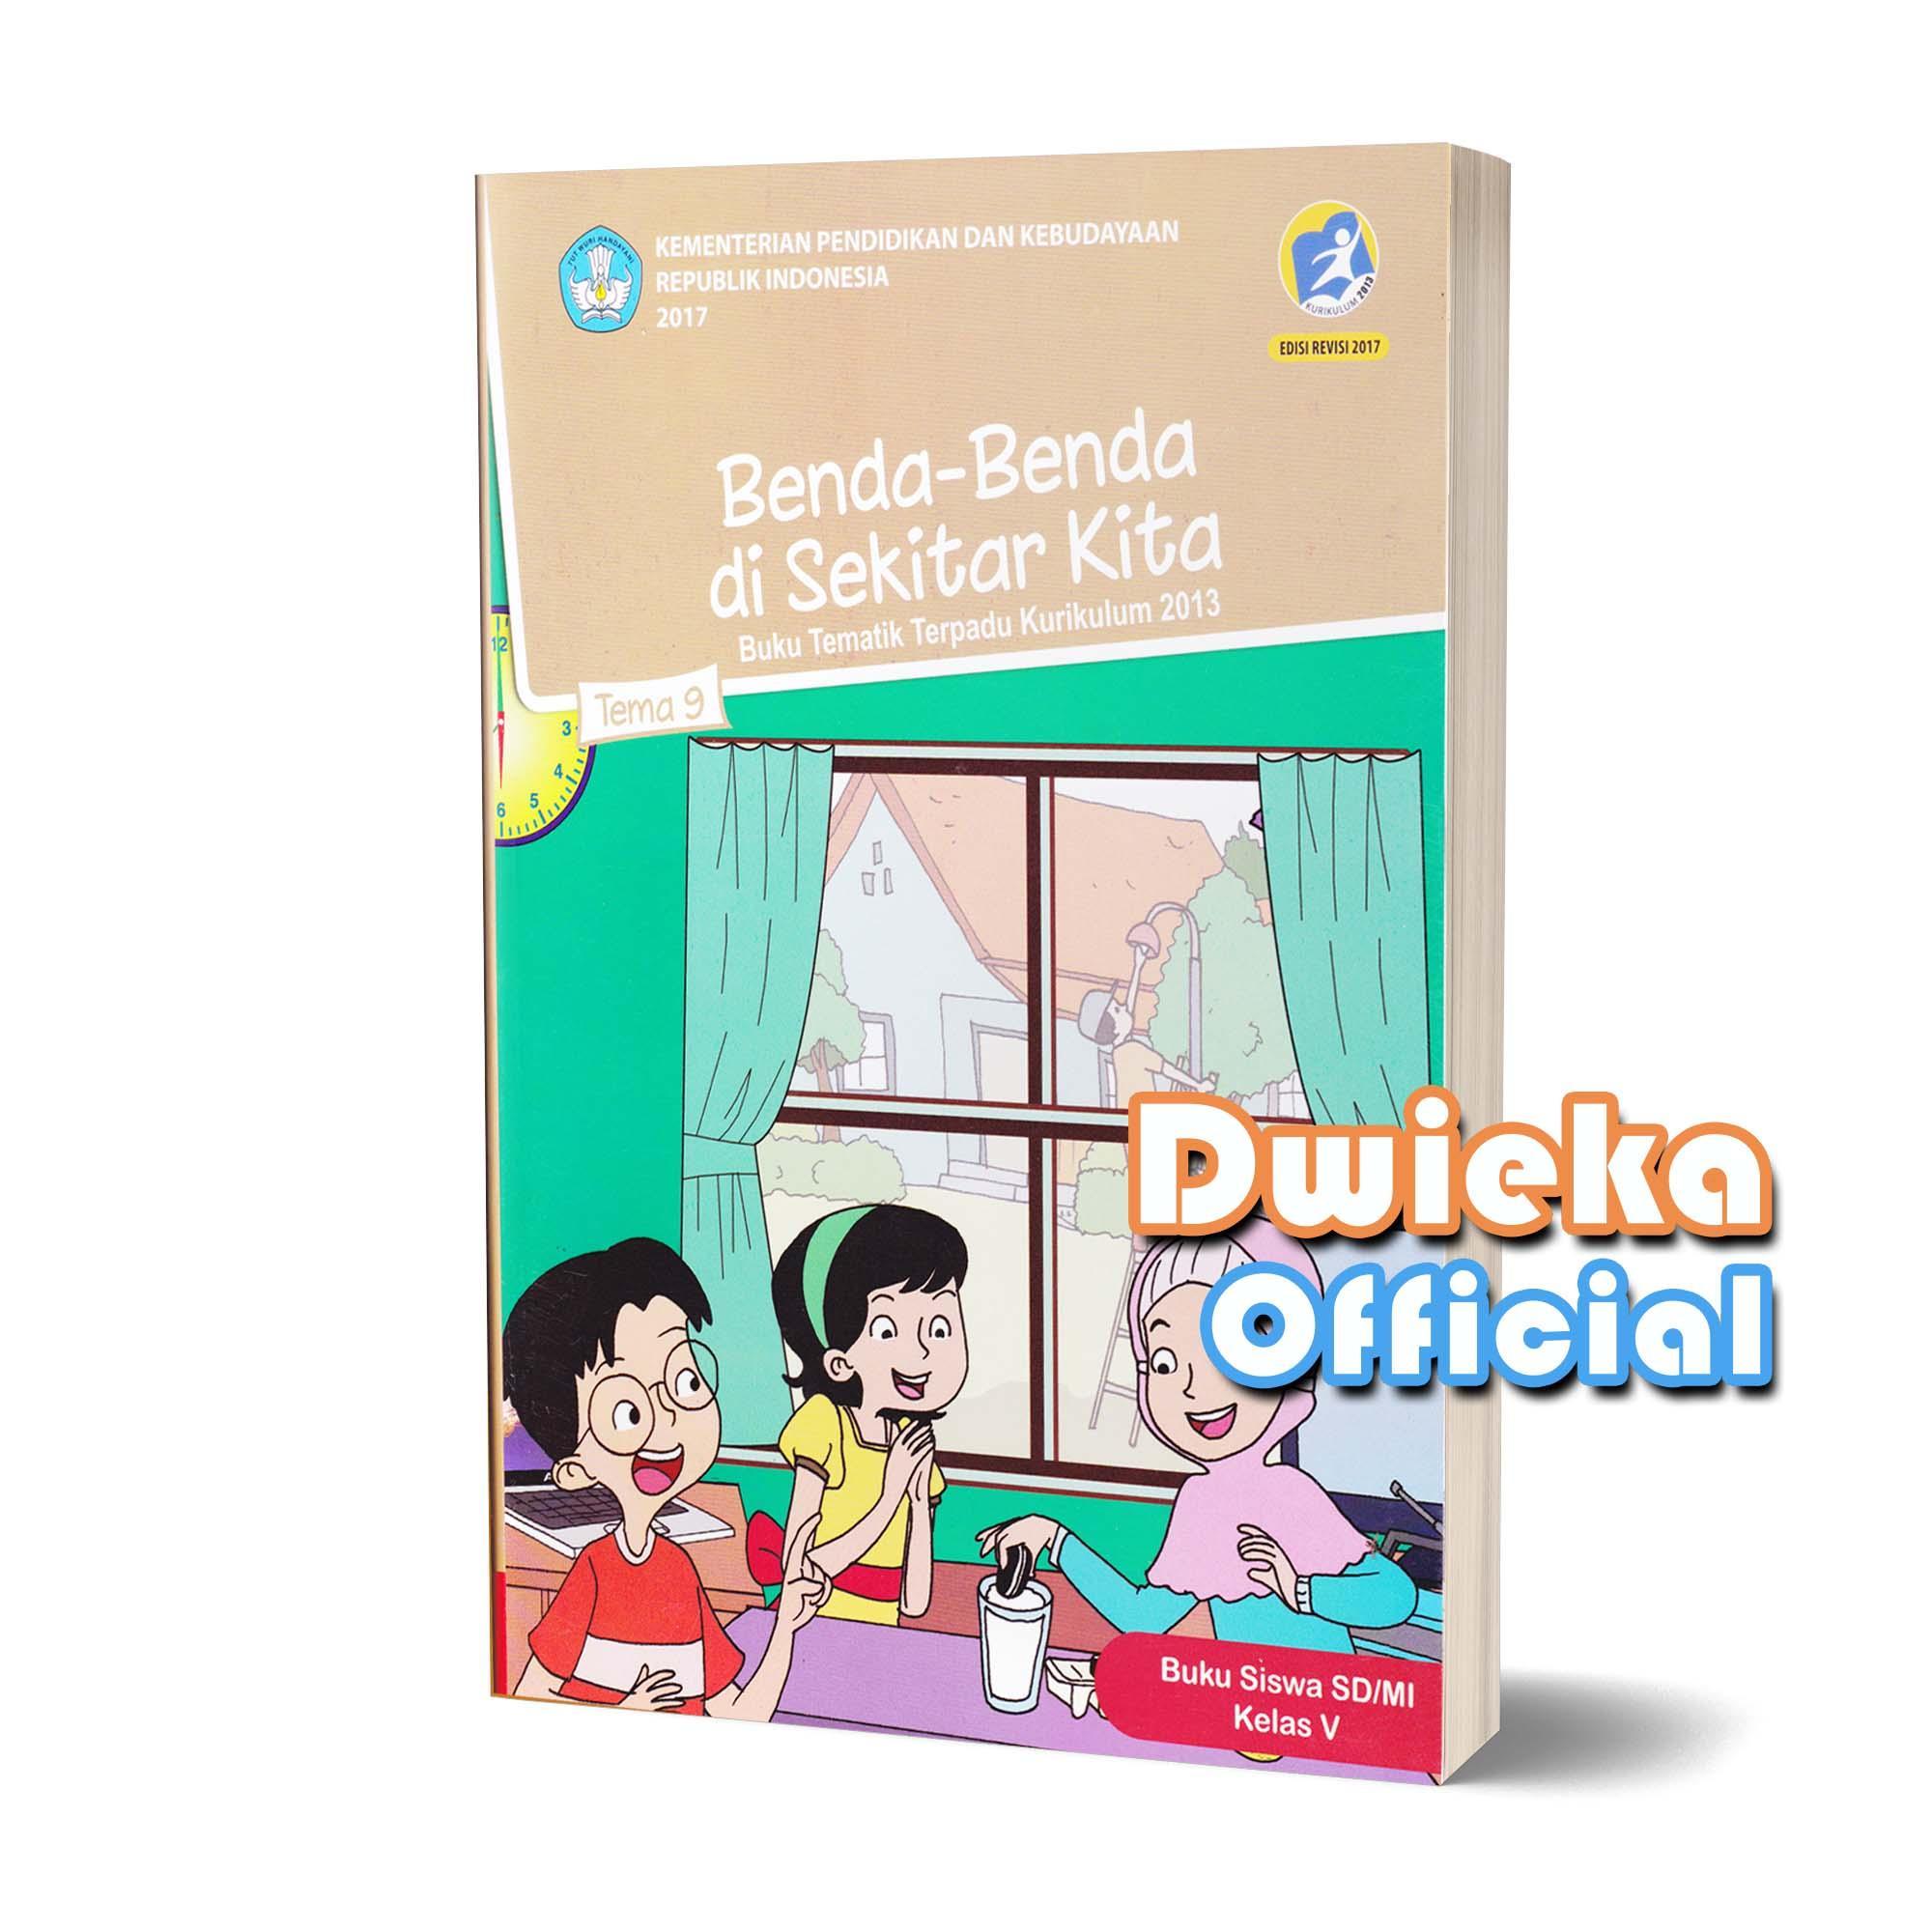 Buku Tematik Kelas 5 Tema 9 Benda-Benda Di Sekitar Kita Kurikulum 2013 Edisi Revisi 2017 By Dwiekaofficial.